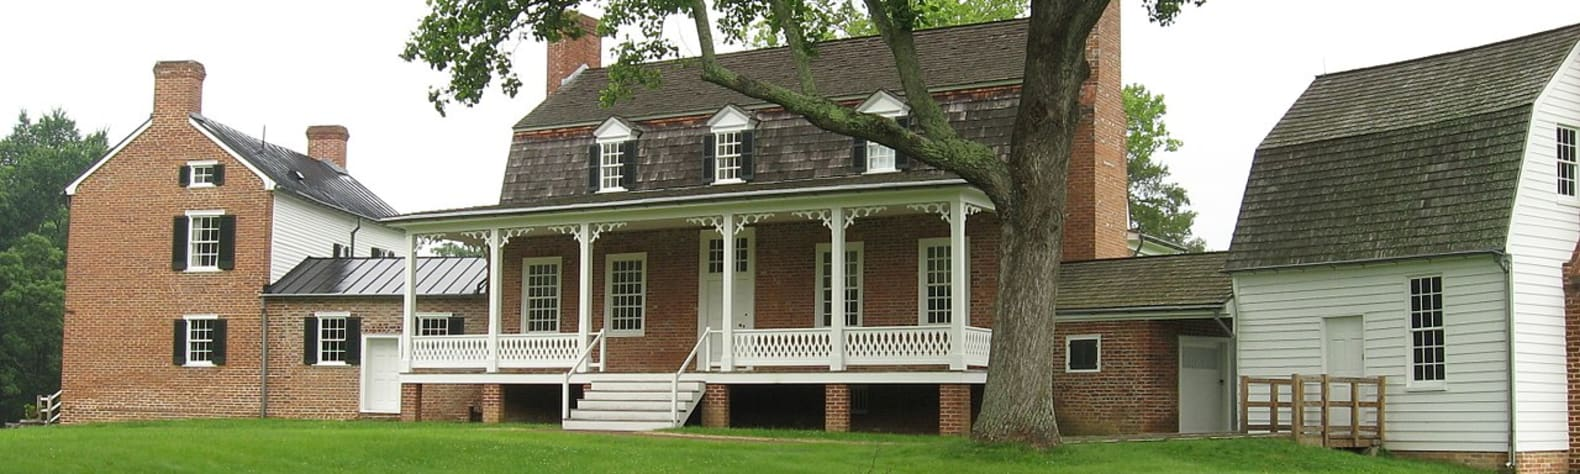 Thomas Stone National Historic Site